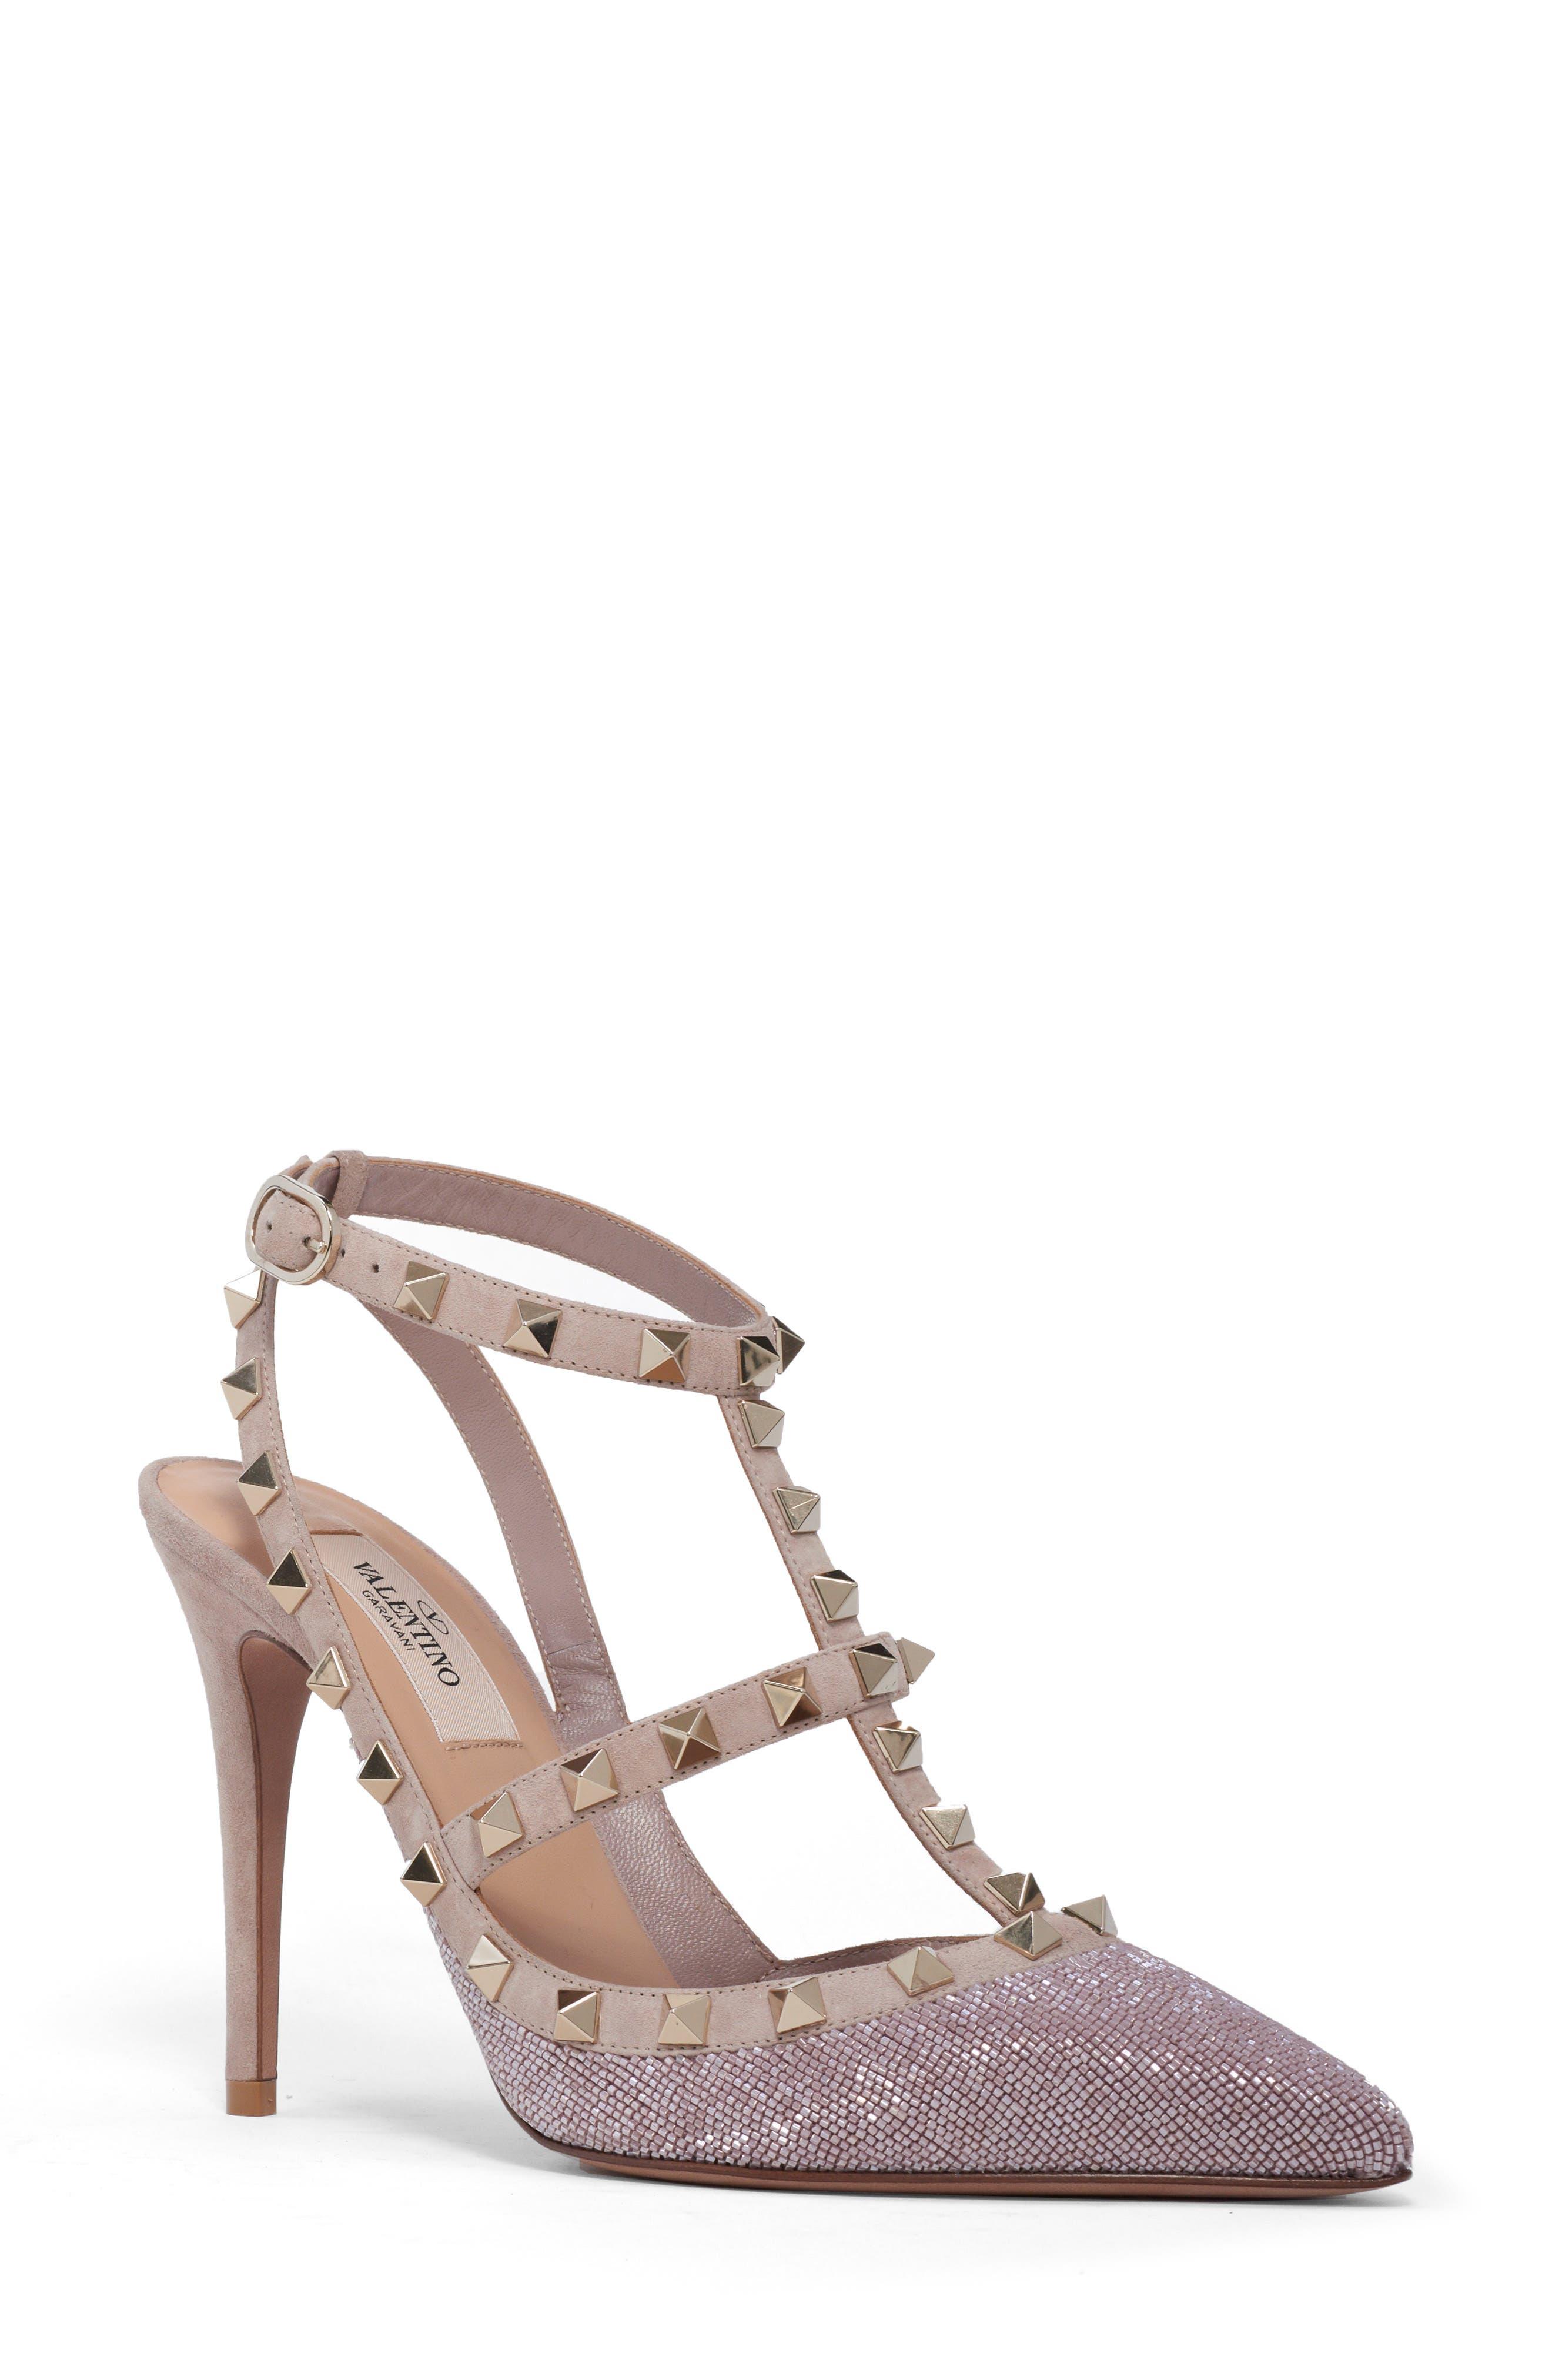 Women's Valentino Garavani Heels